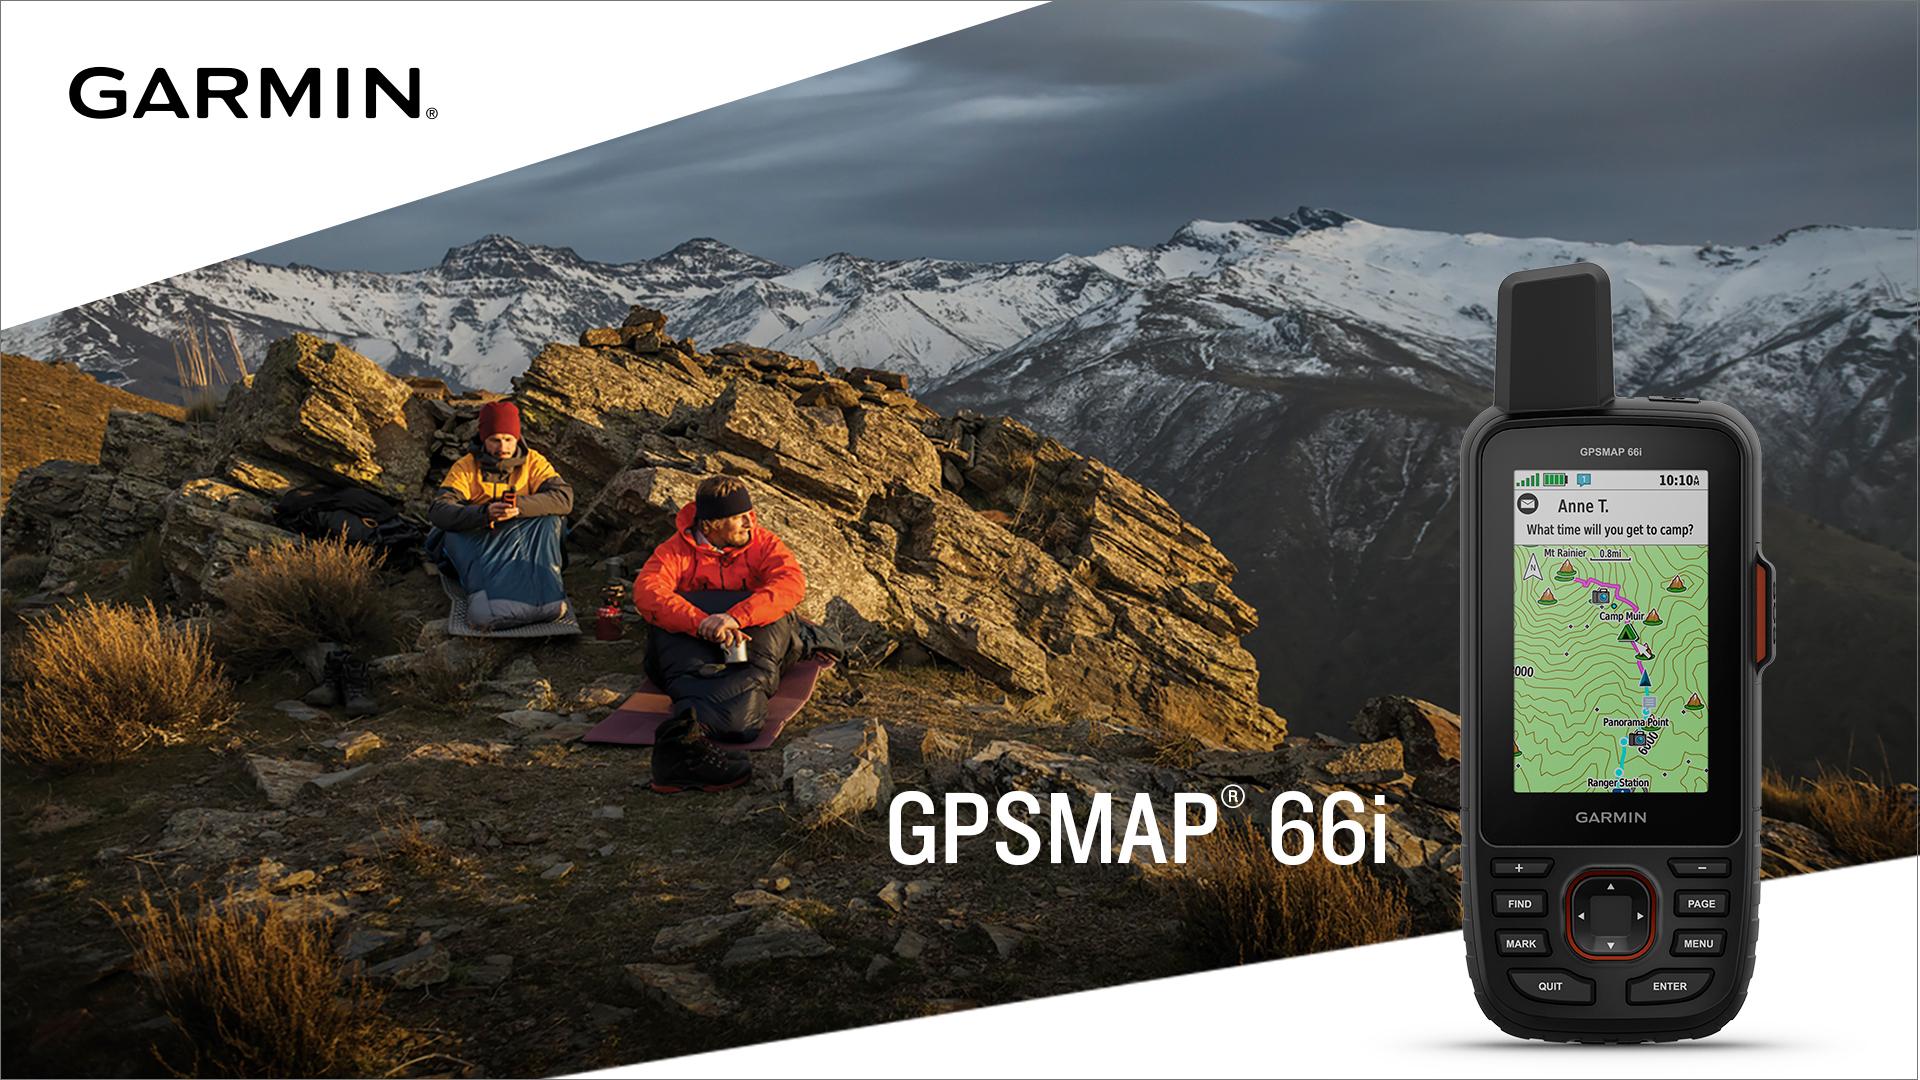 Garmin's flagship handheld navigator meets global